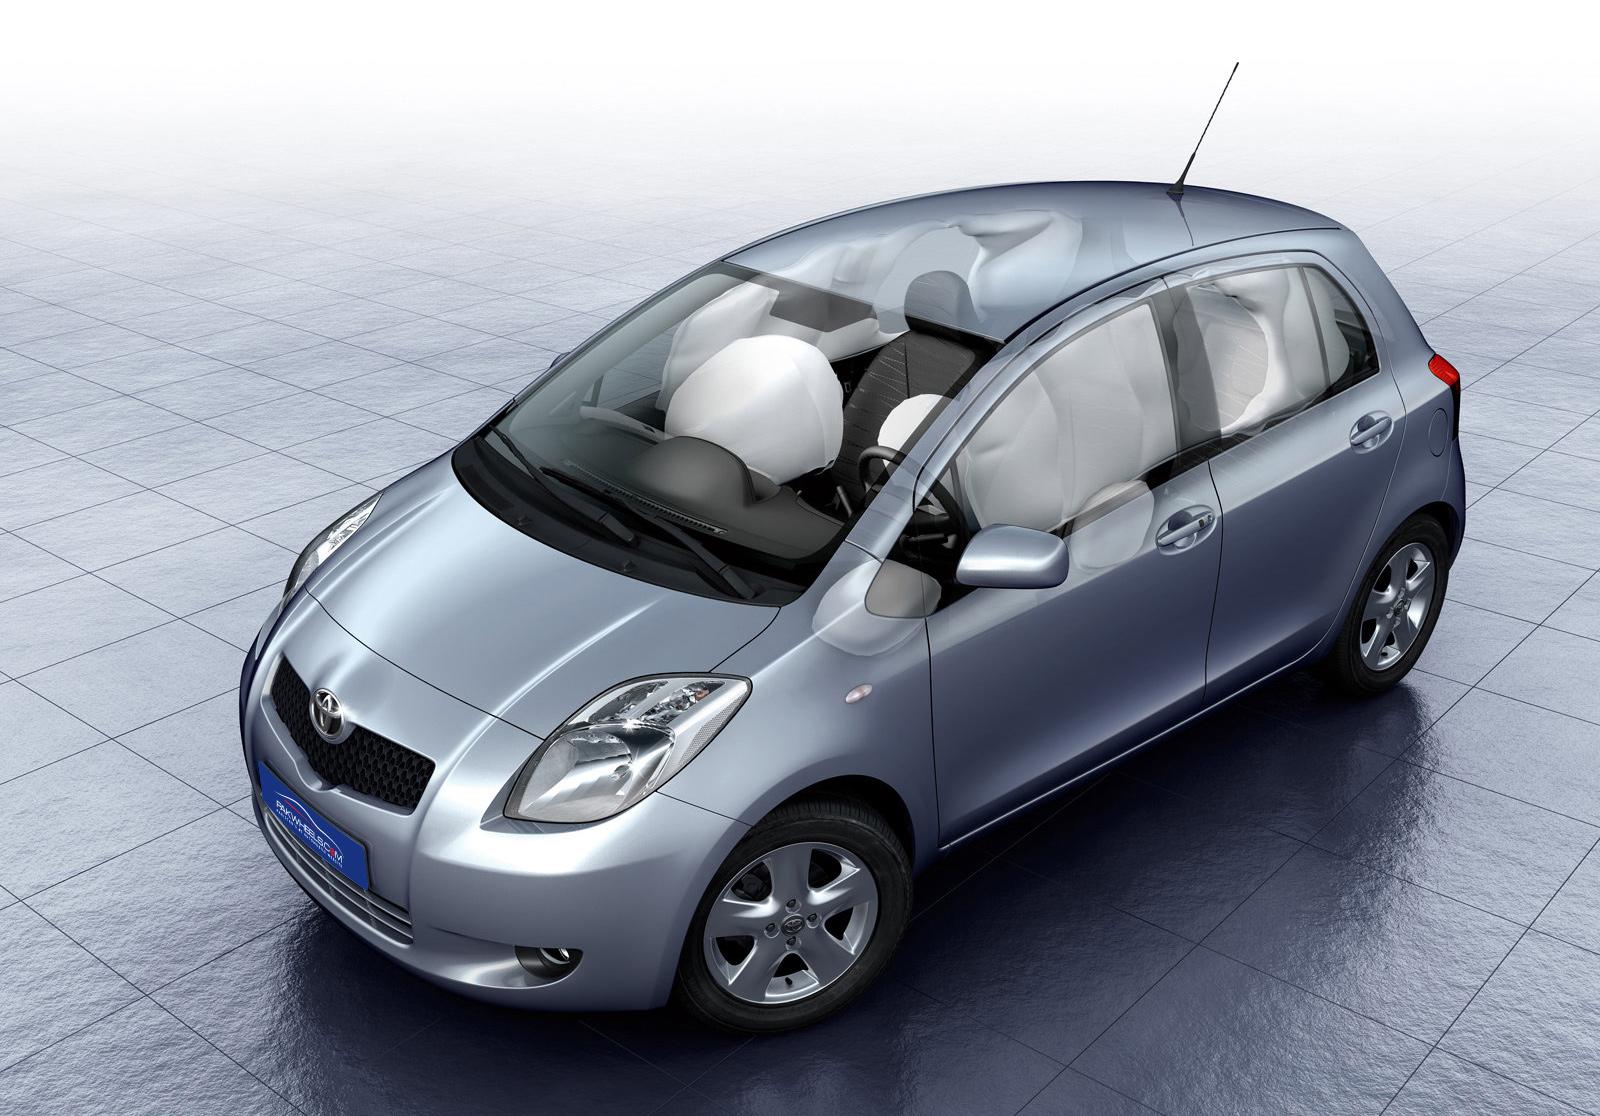 Toyota-yaris-2006-1600-721